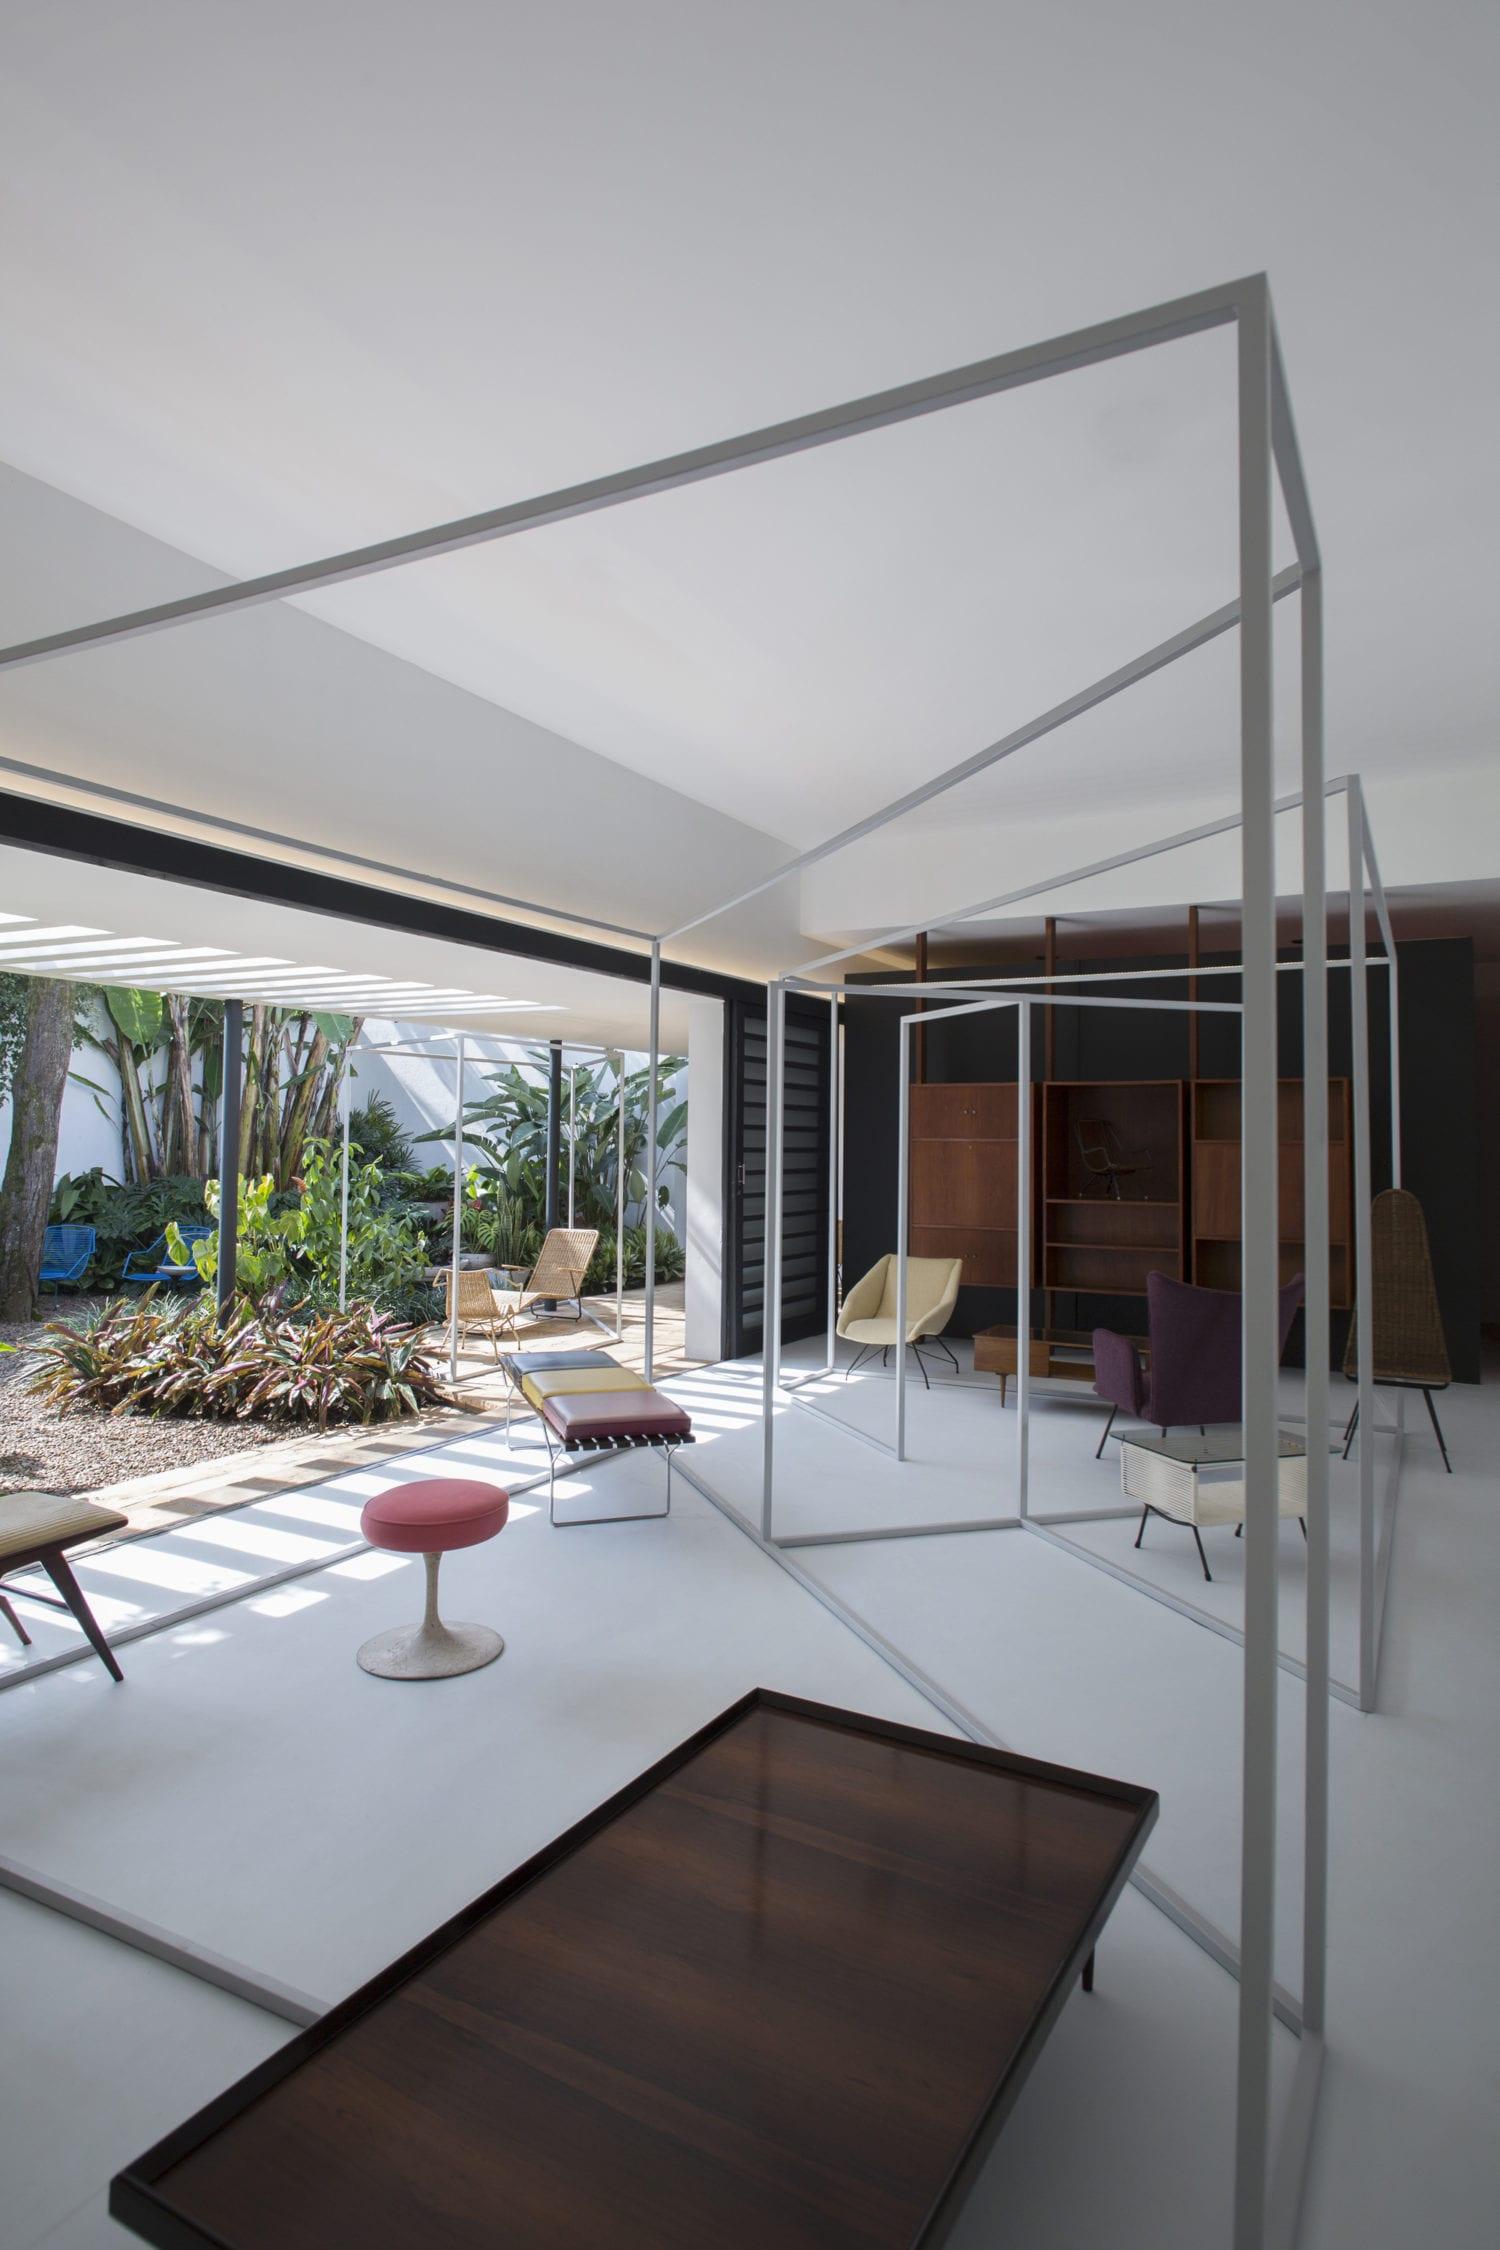 Apartment 61 Home Gallery In Sao Paulo Brazil By Mnma Studio Yellowtrace 02